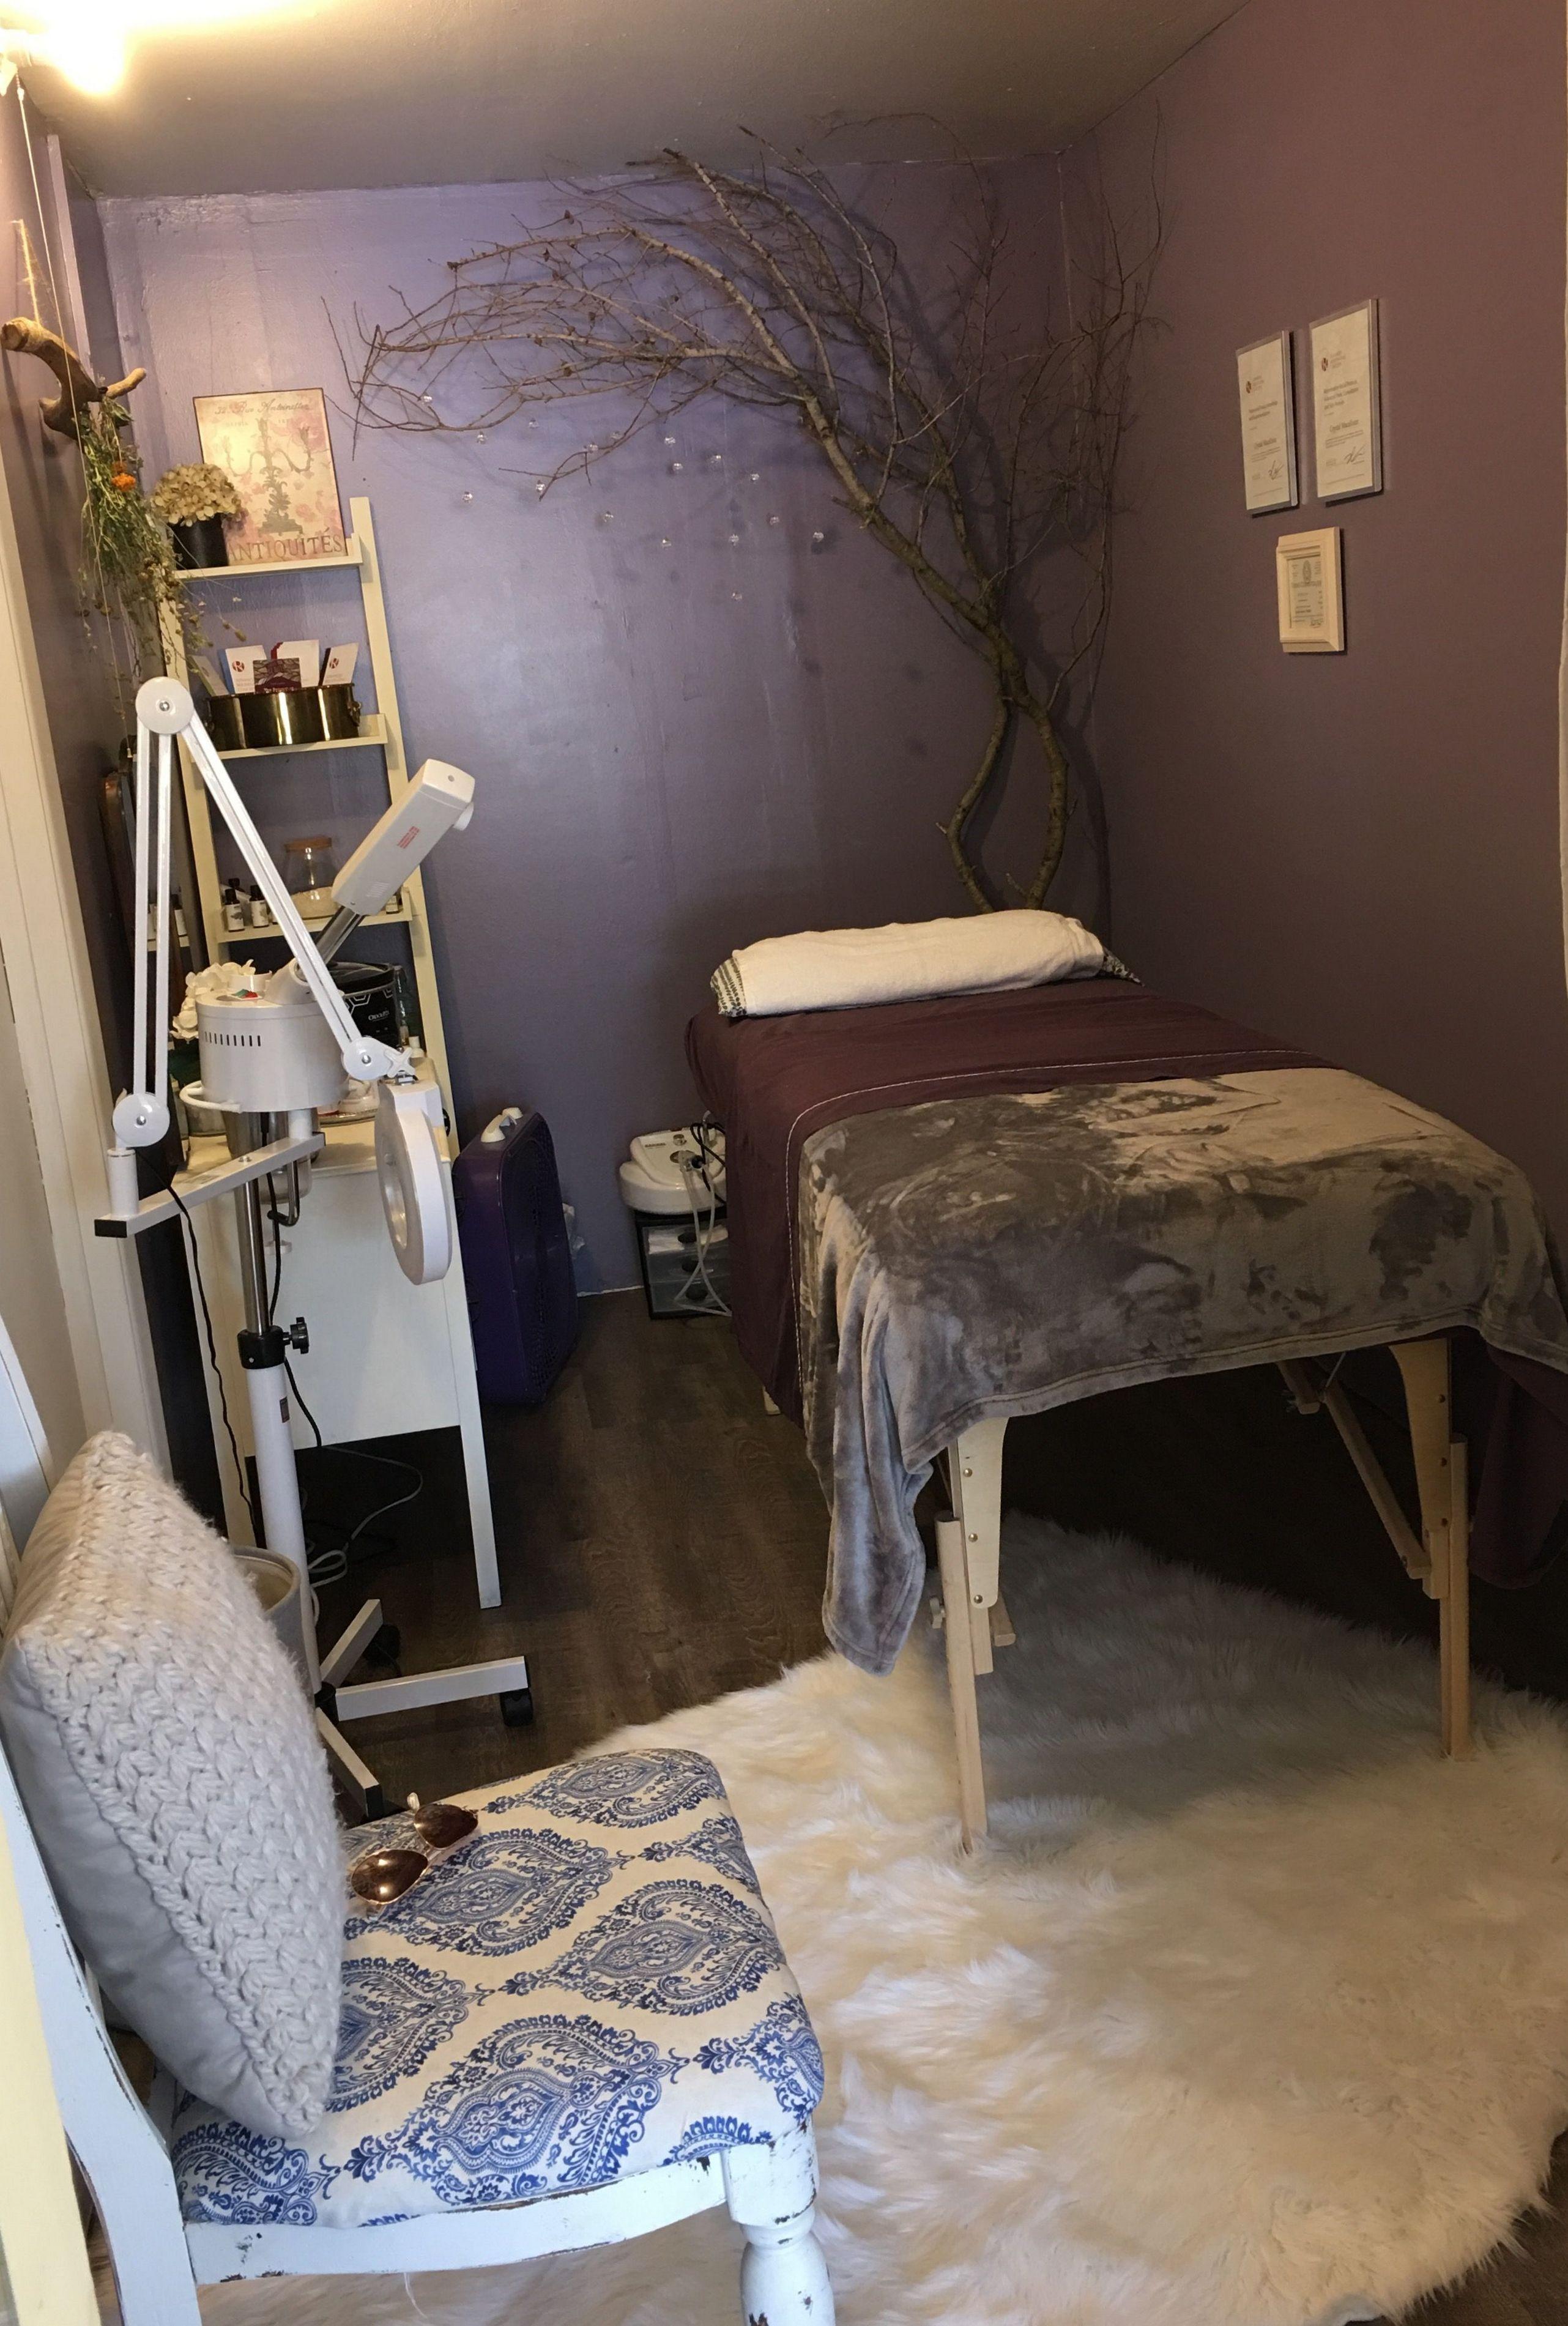 Top 99 Awesome Spa Decor Ideas Estheticians | Treatment room ...